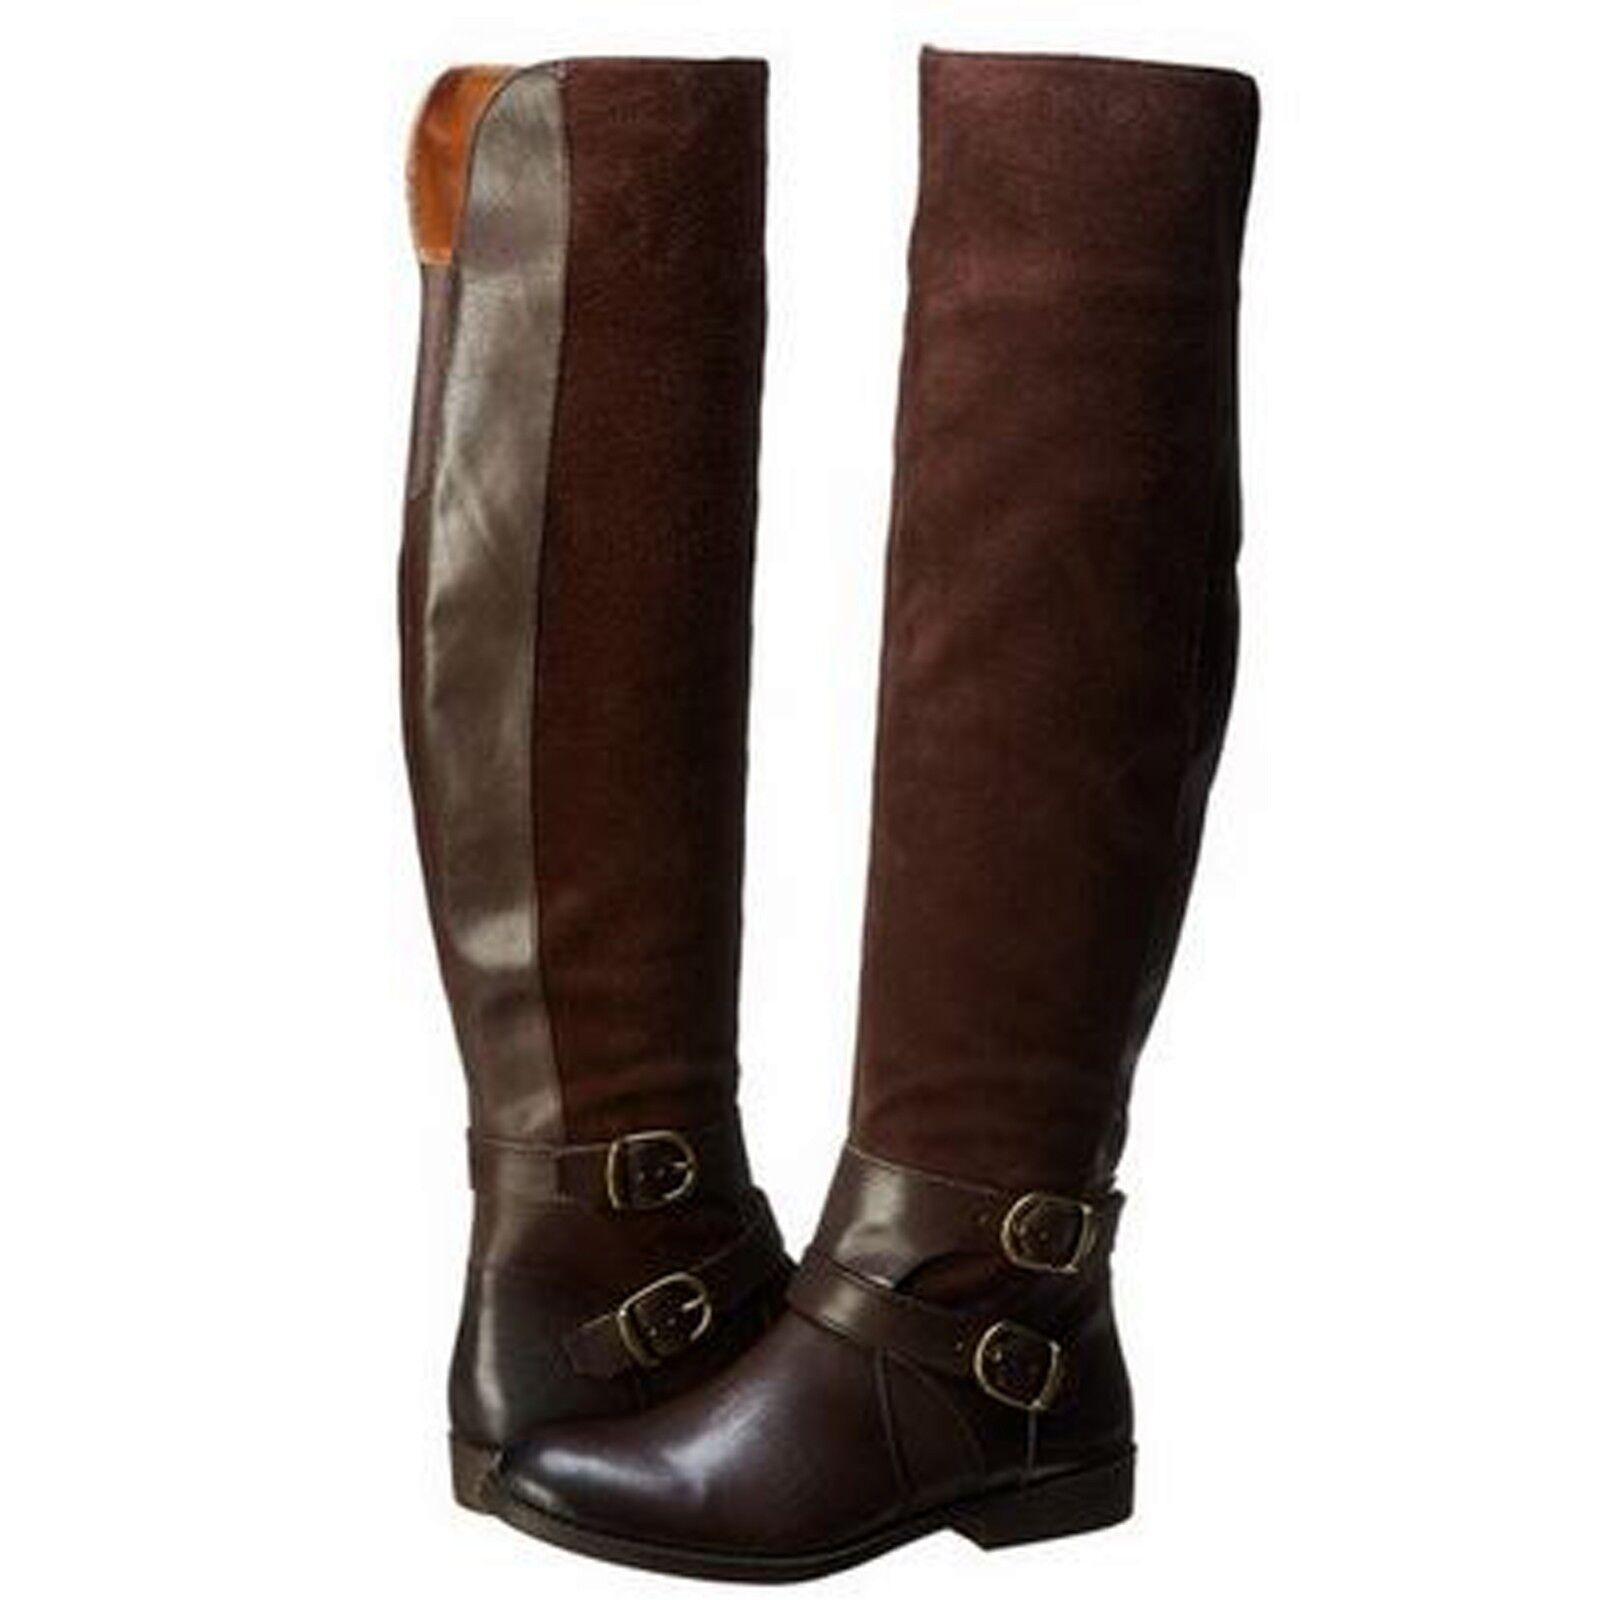 Lucky Brand Womens Zosha Side Zip Buckle Strap Tall Equestrian Riding Boots